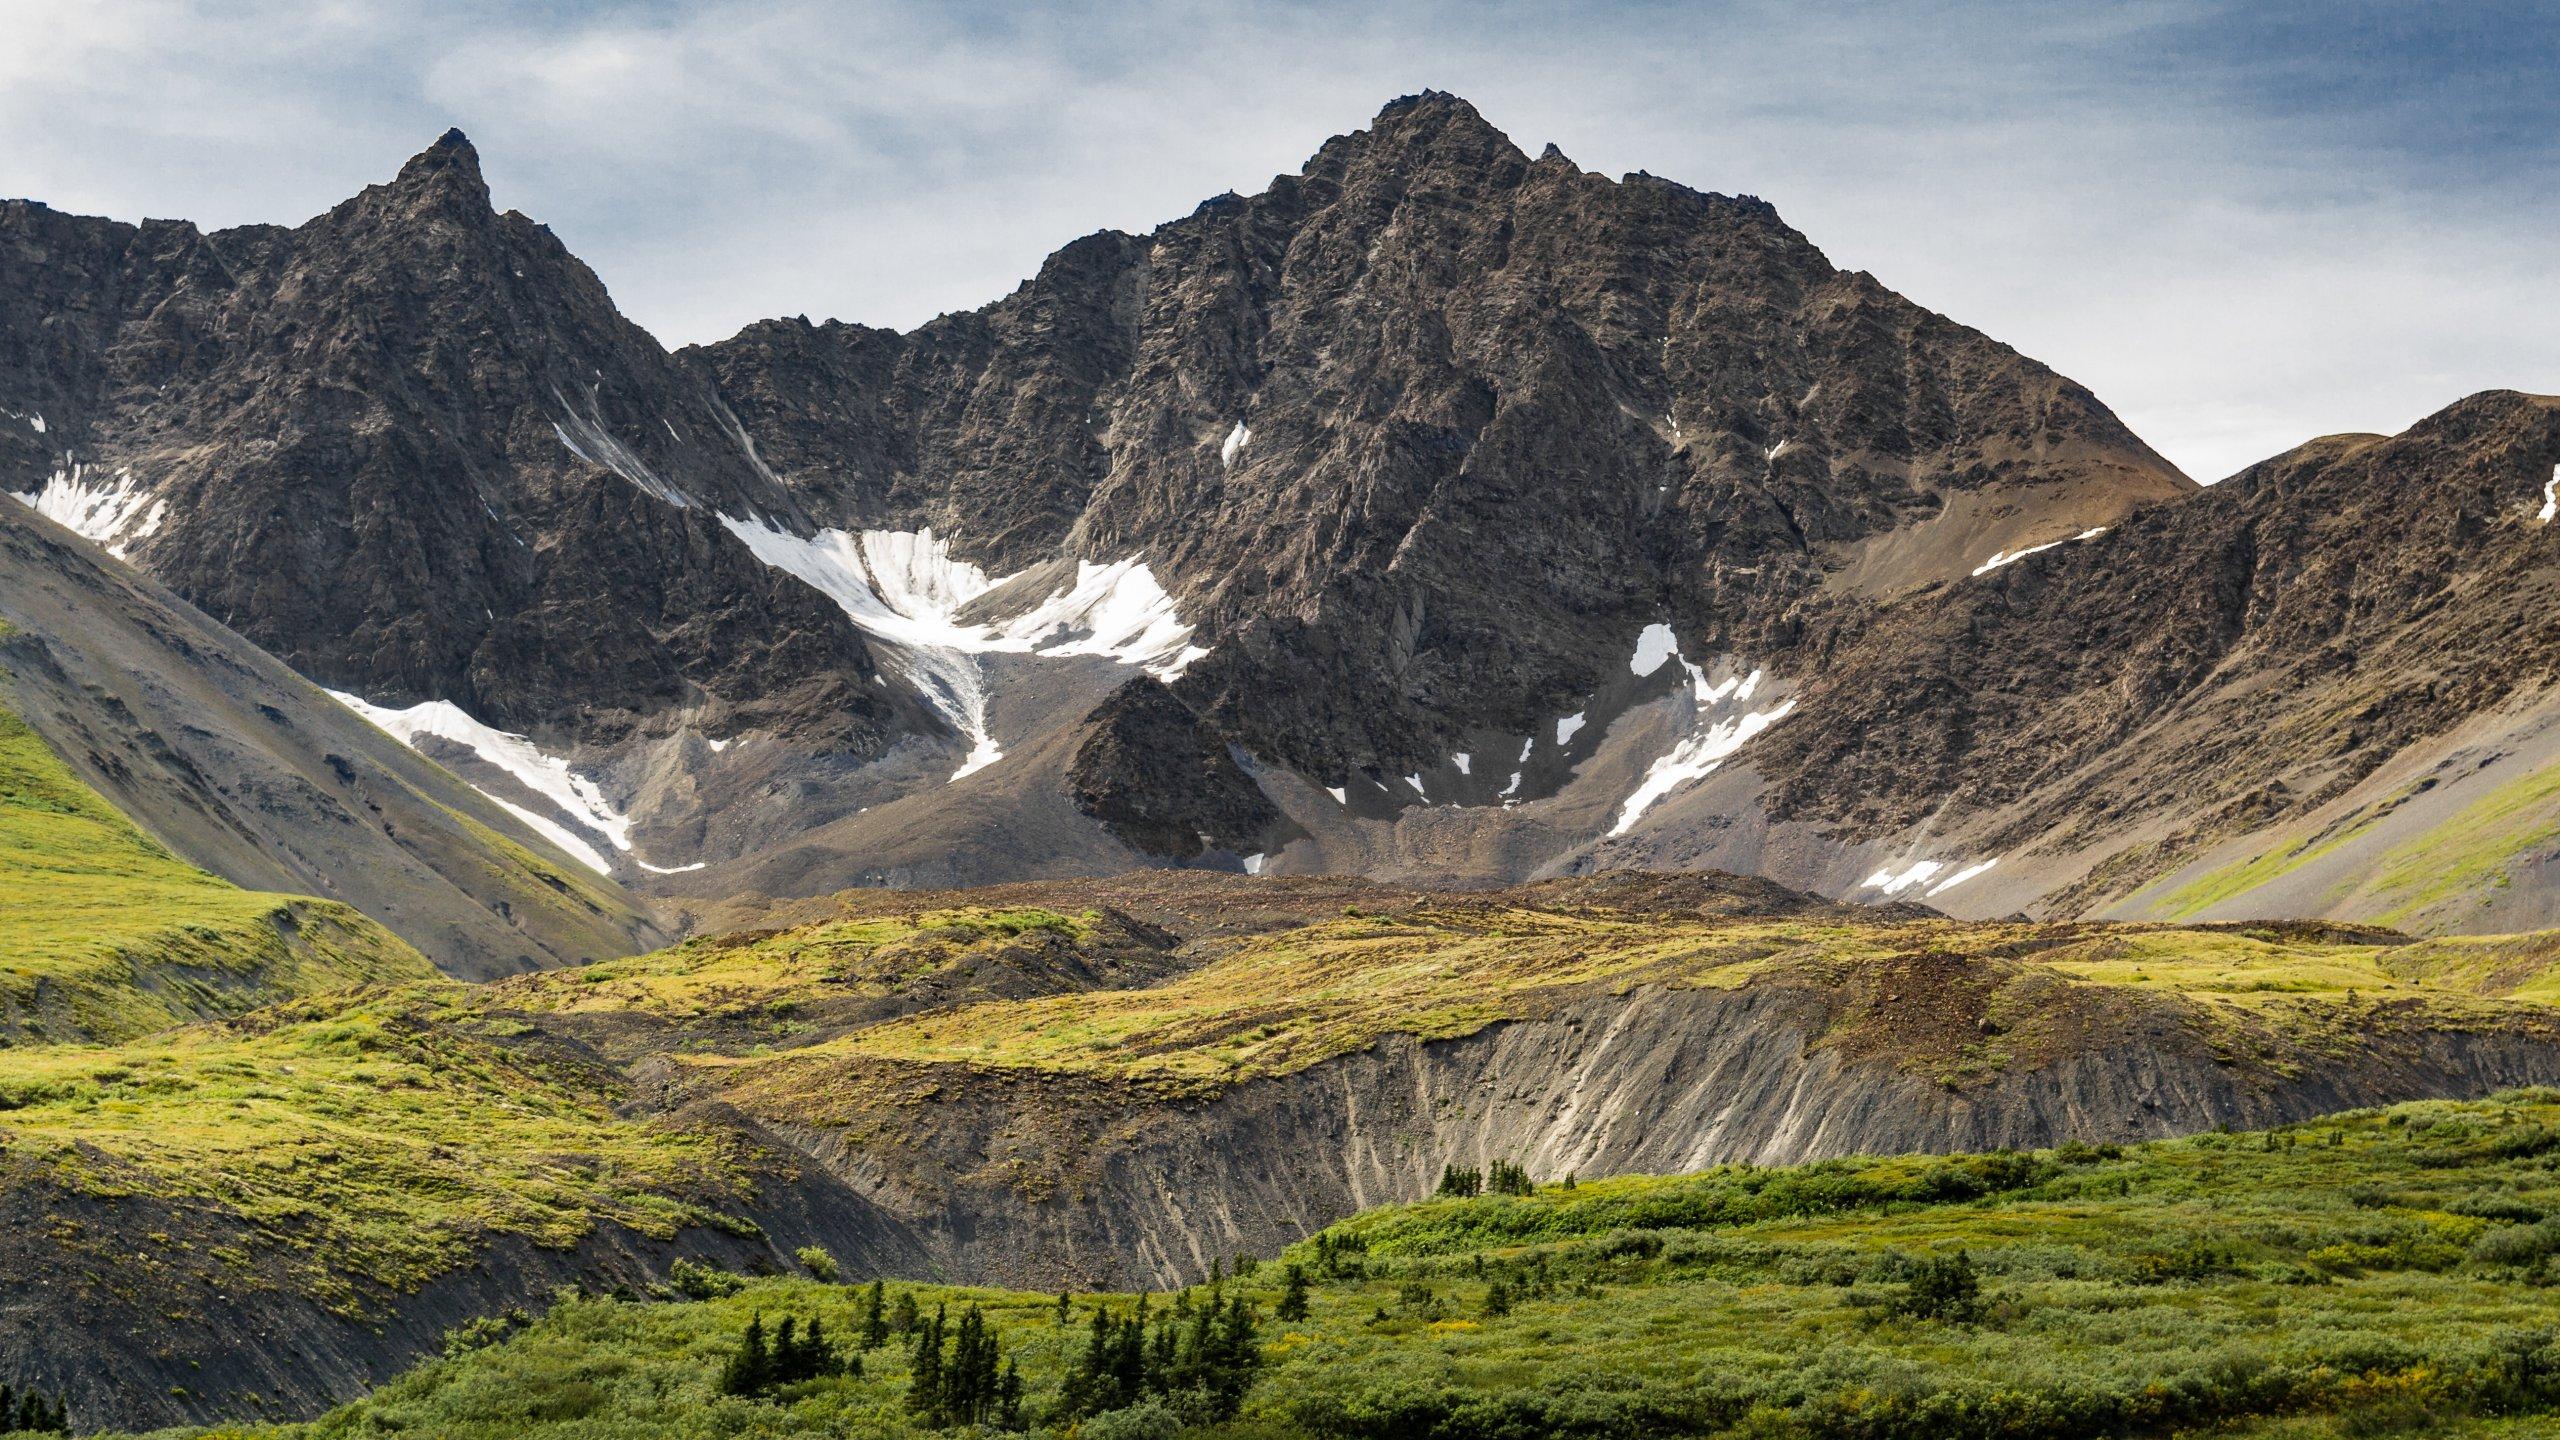 Leiderschapsreis into the wild - expeditie - leiderschapsreizen